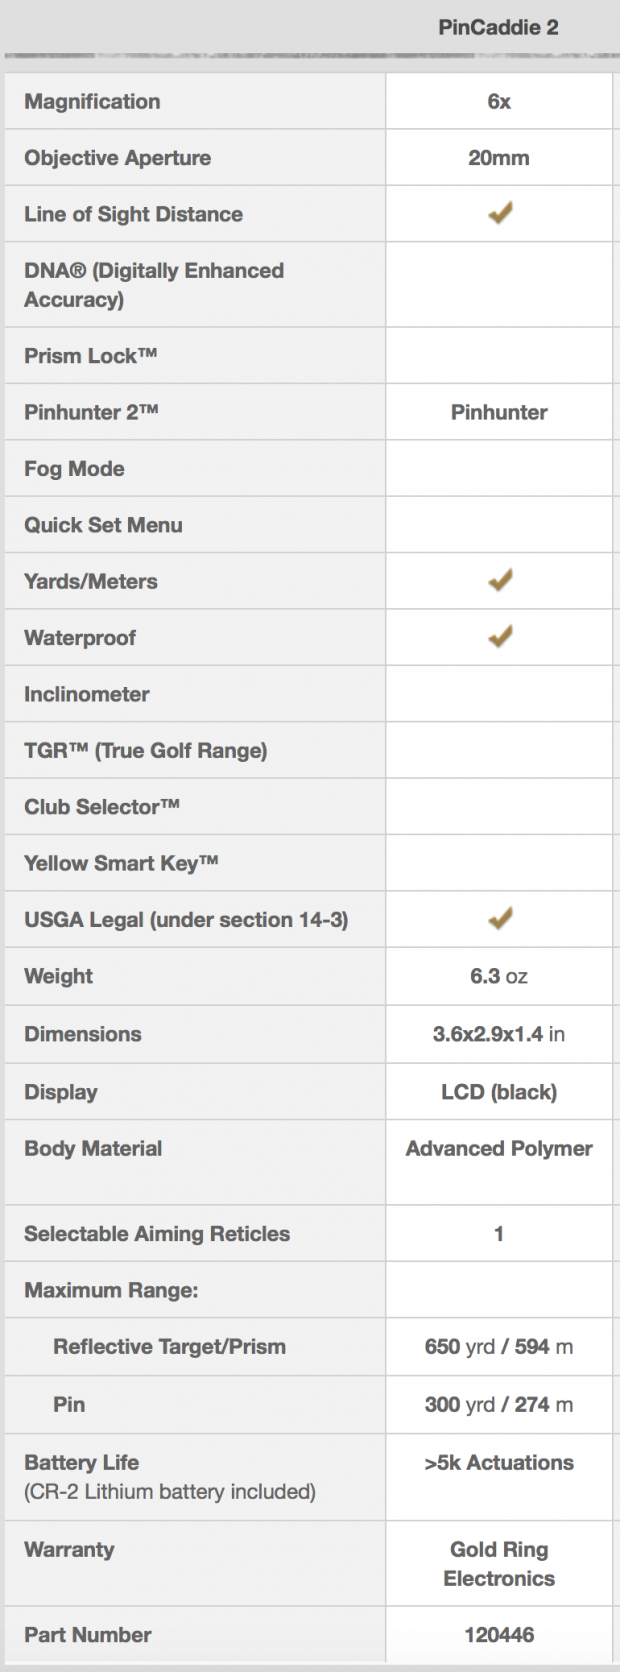 Leupold PinCaddie 2 Golf rangefinder - specifications and features